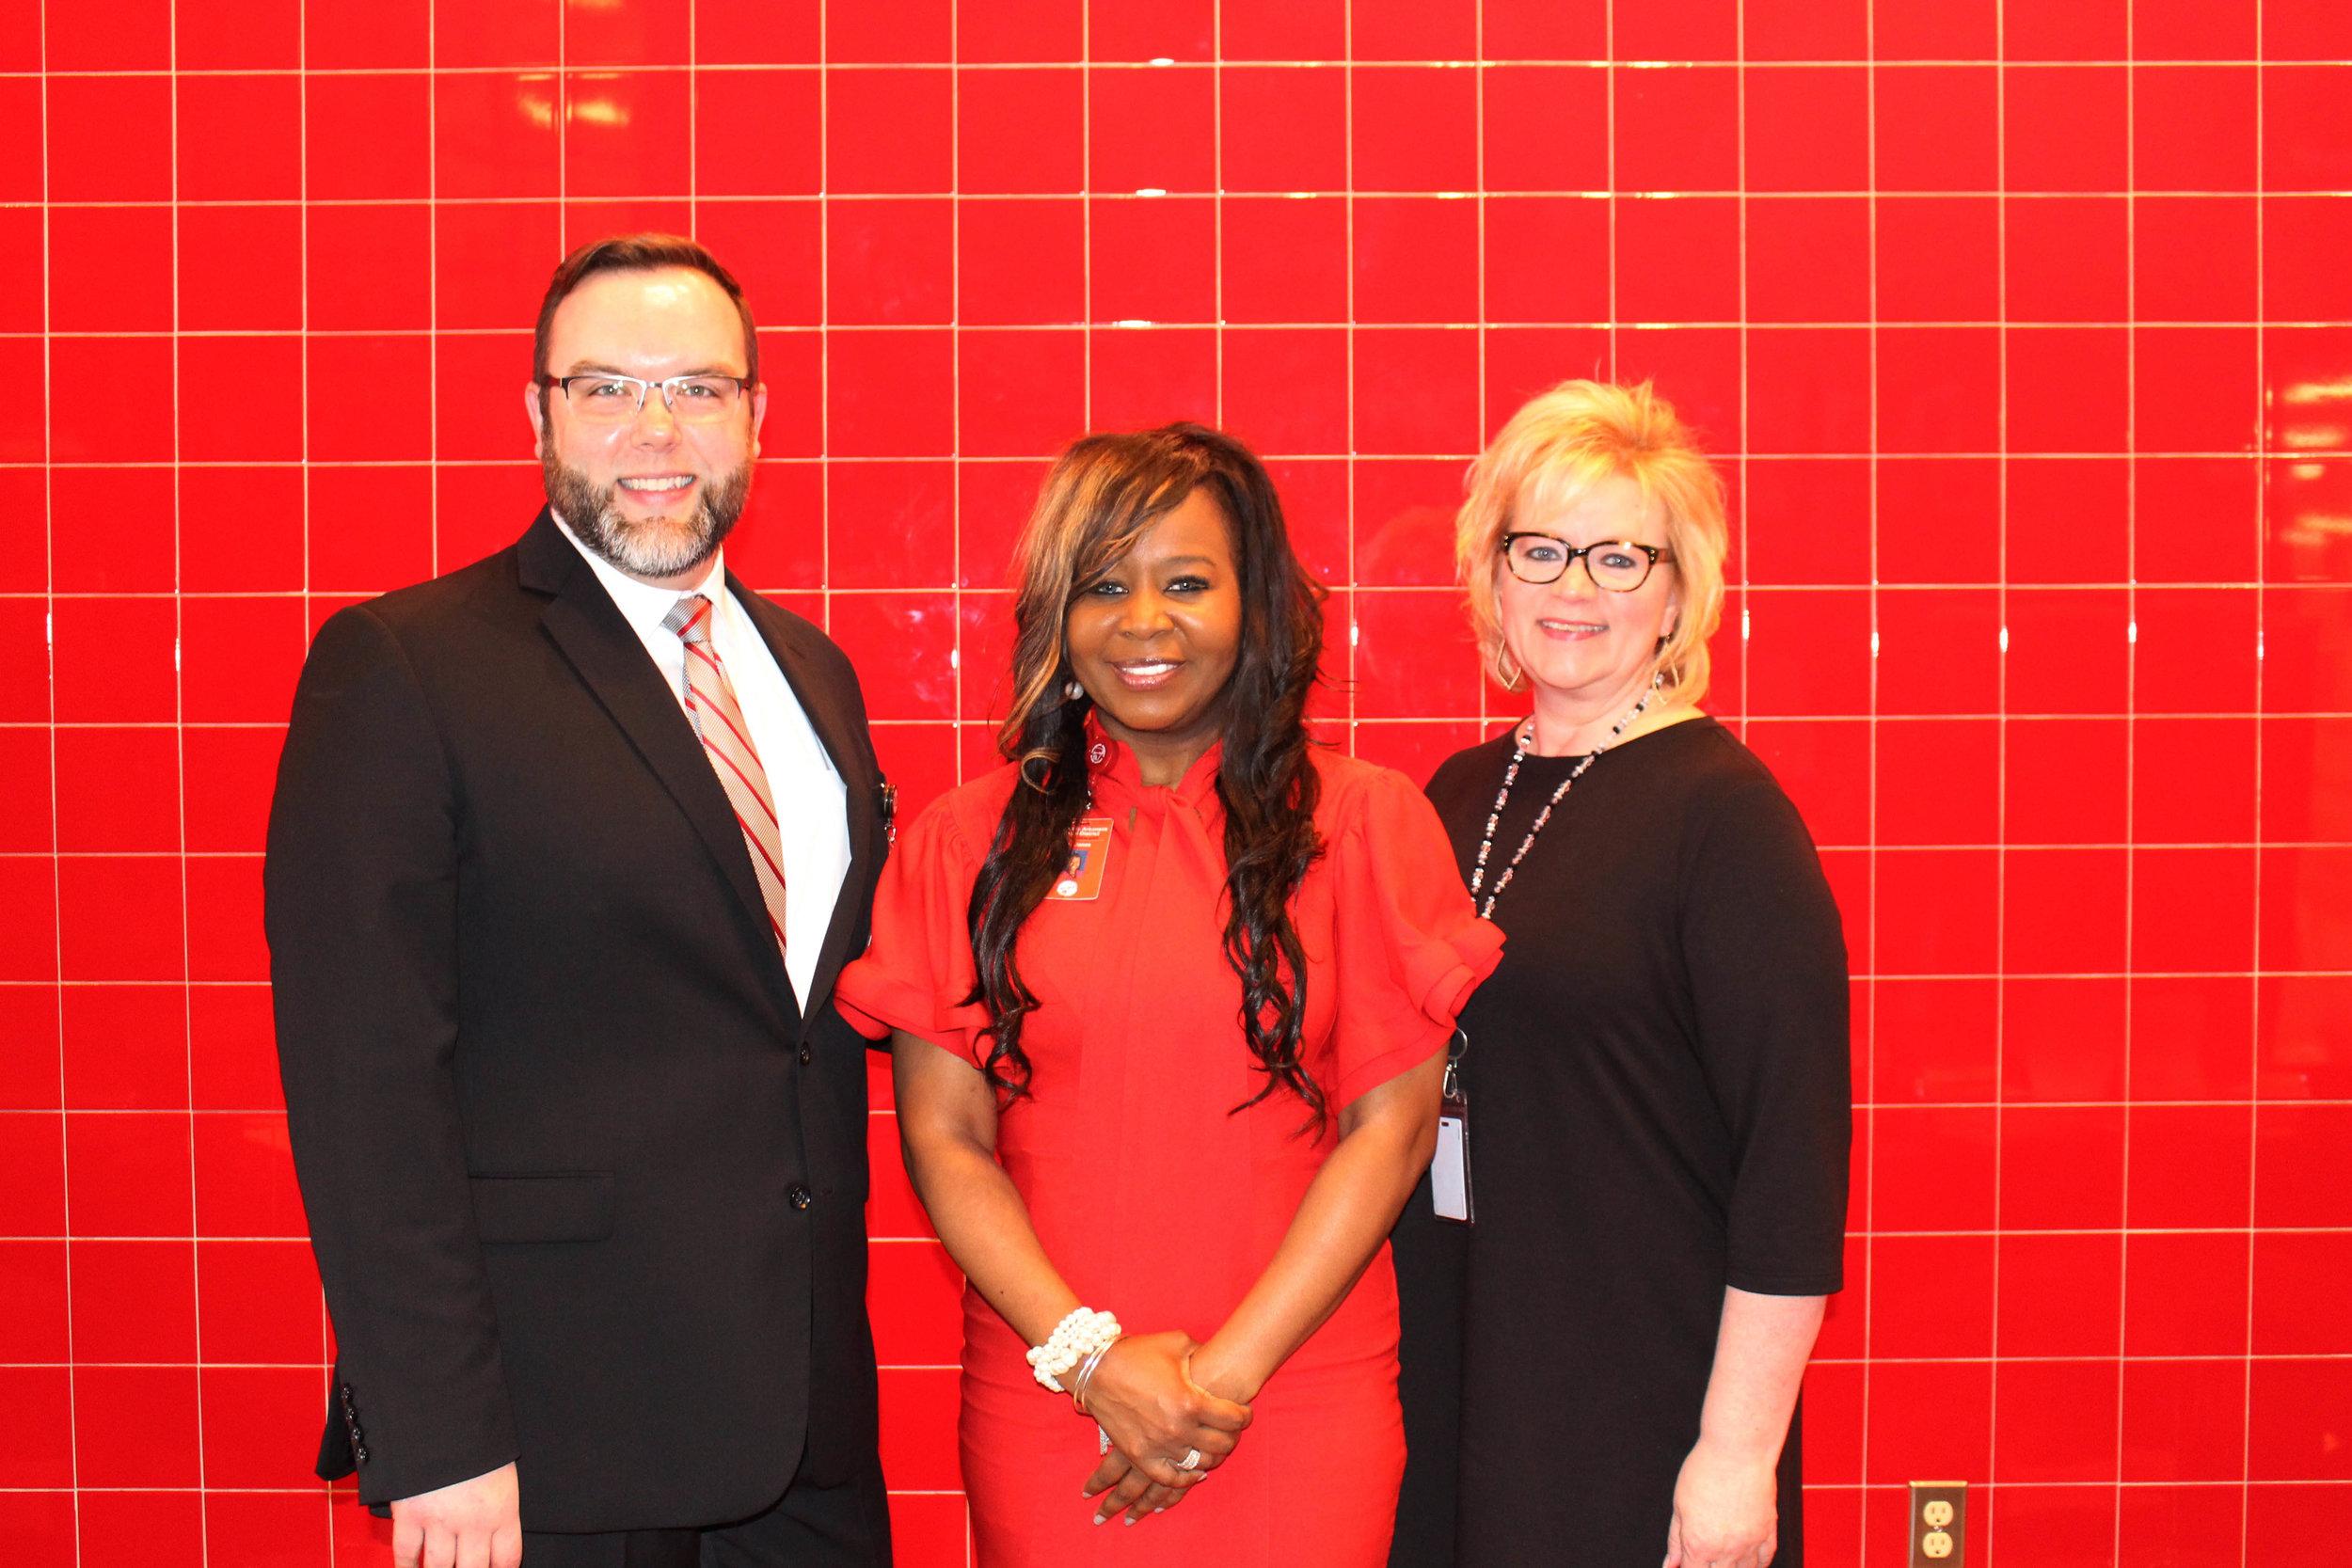 Michael Odom, Lekia Jones and Carol Miller